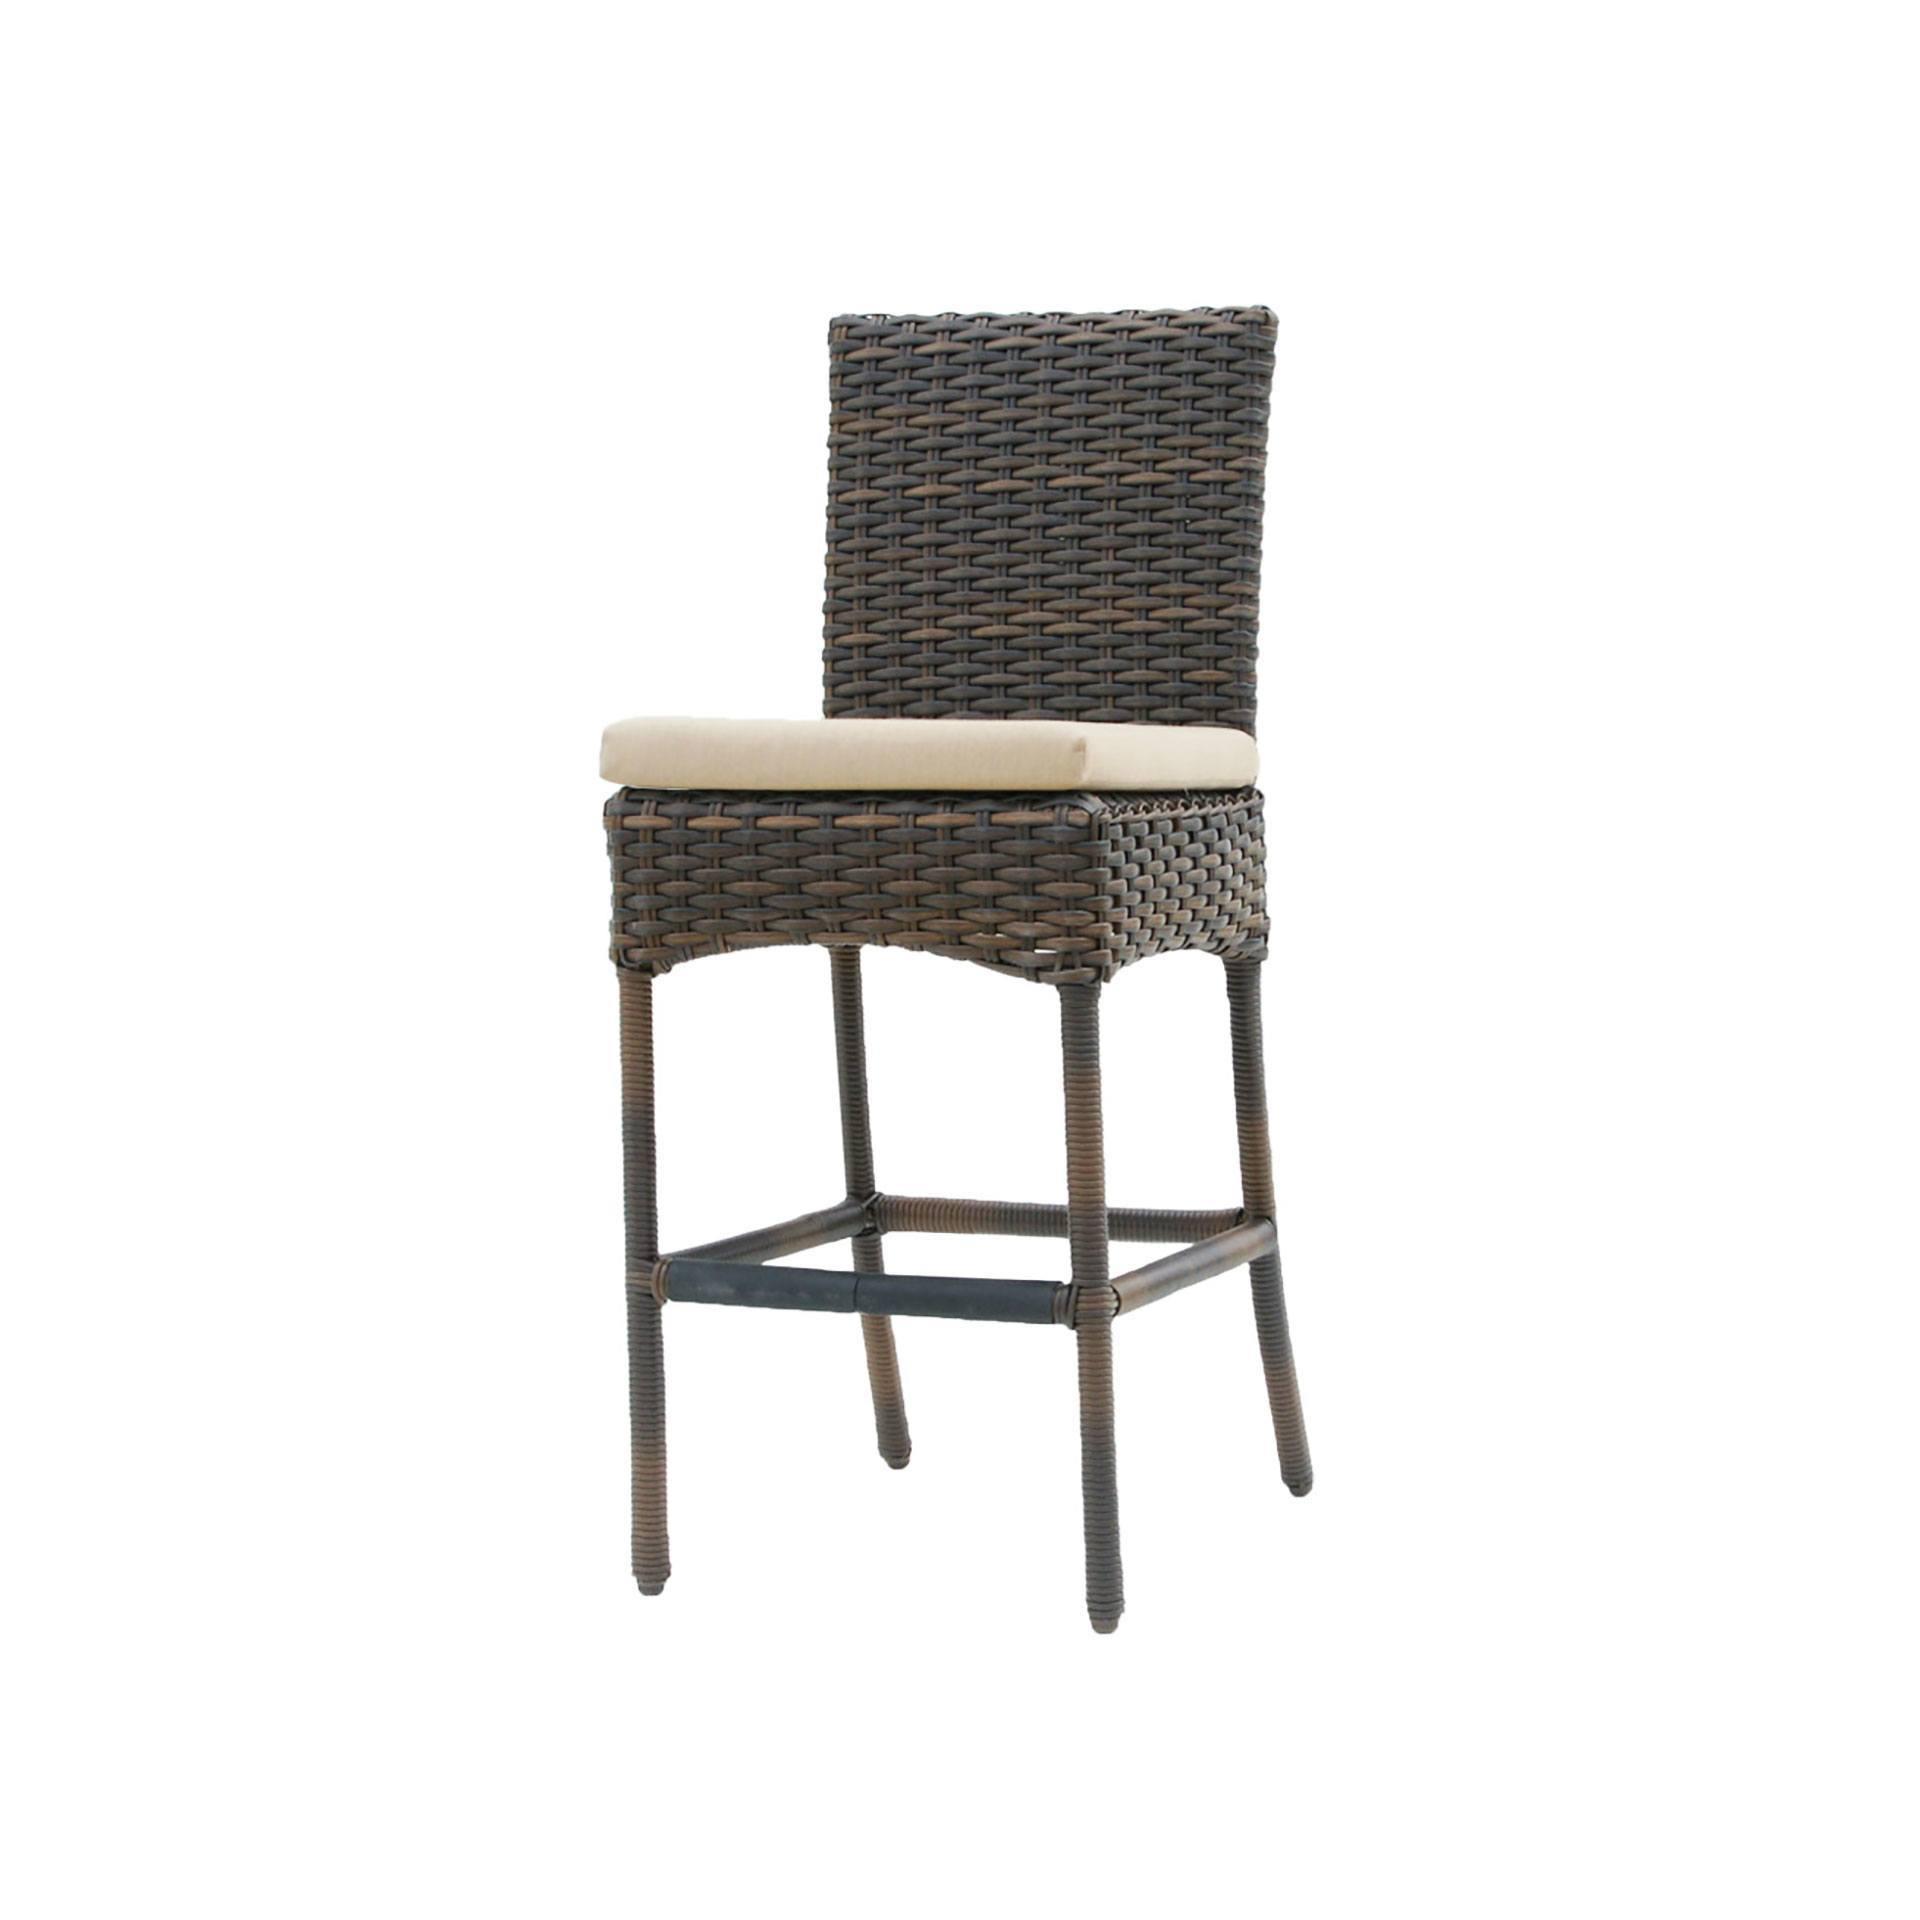 patio high back chair cushions power recliner chairs canada ratana portfino bar stool - leisure living